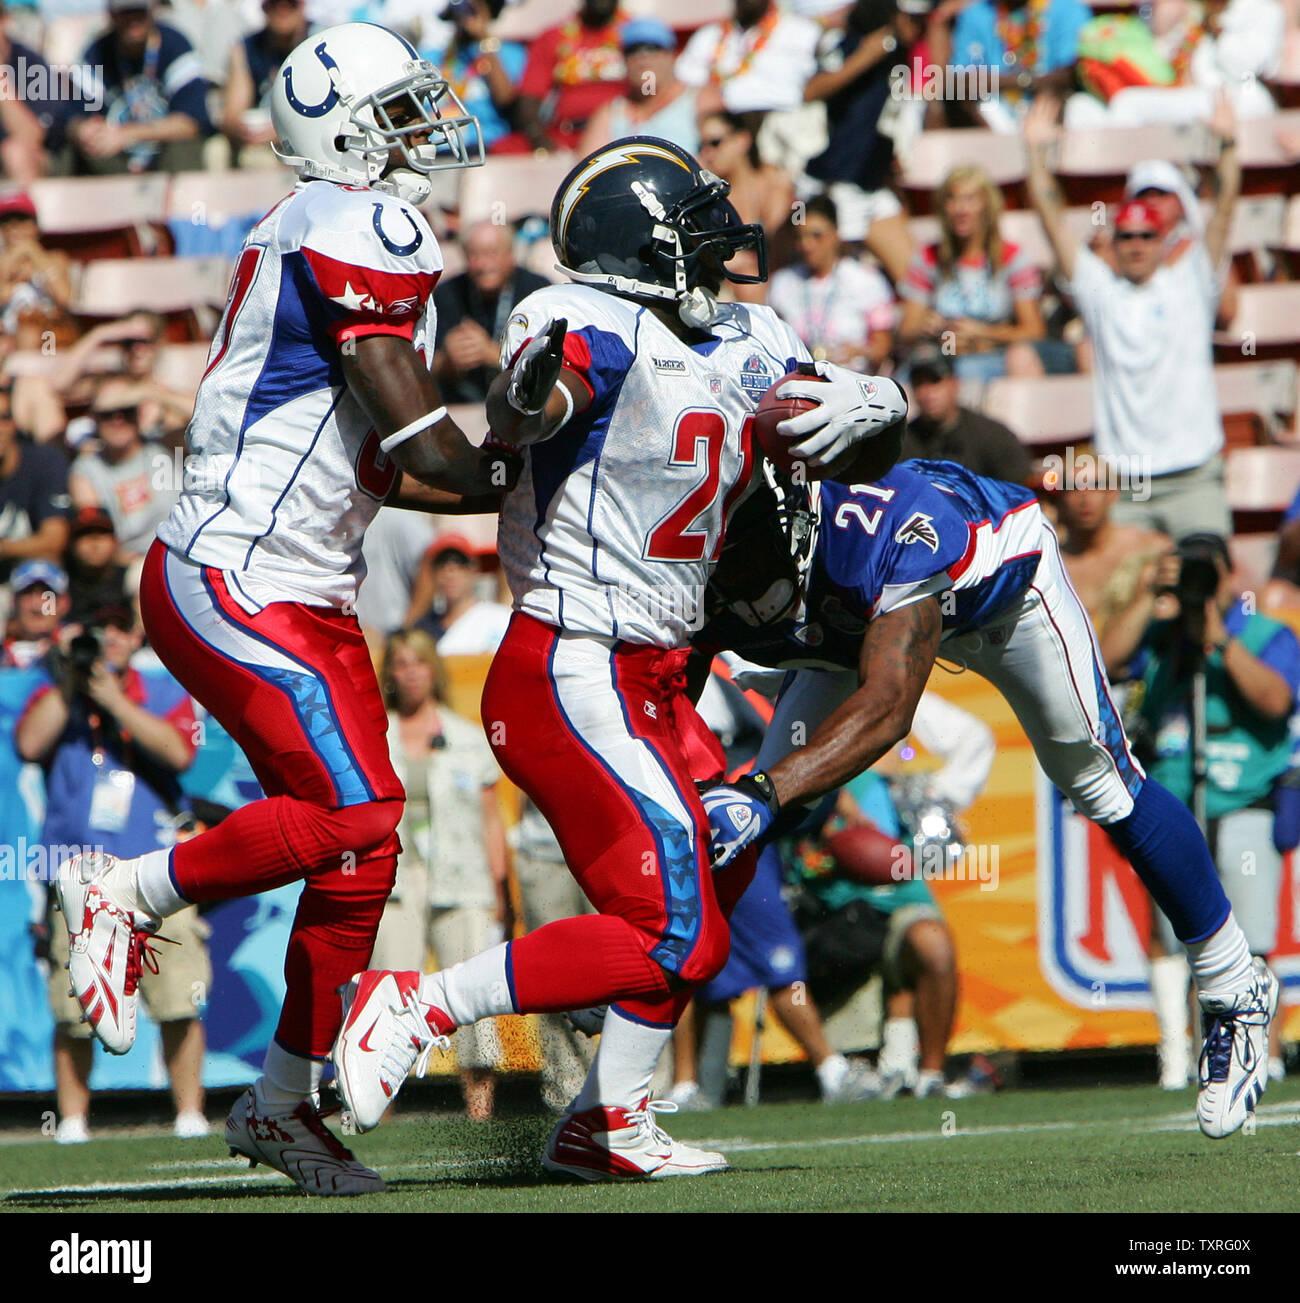 Aloha Stadium Stock Photos & Aloha Stadium Stock Images - Alamy